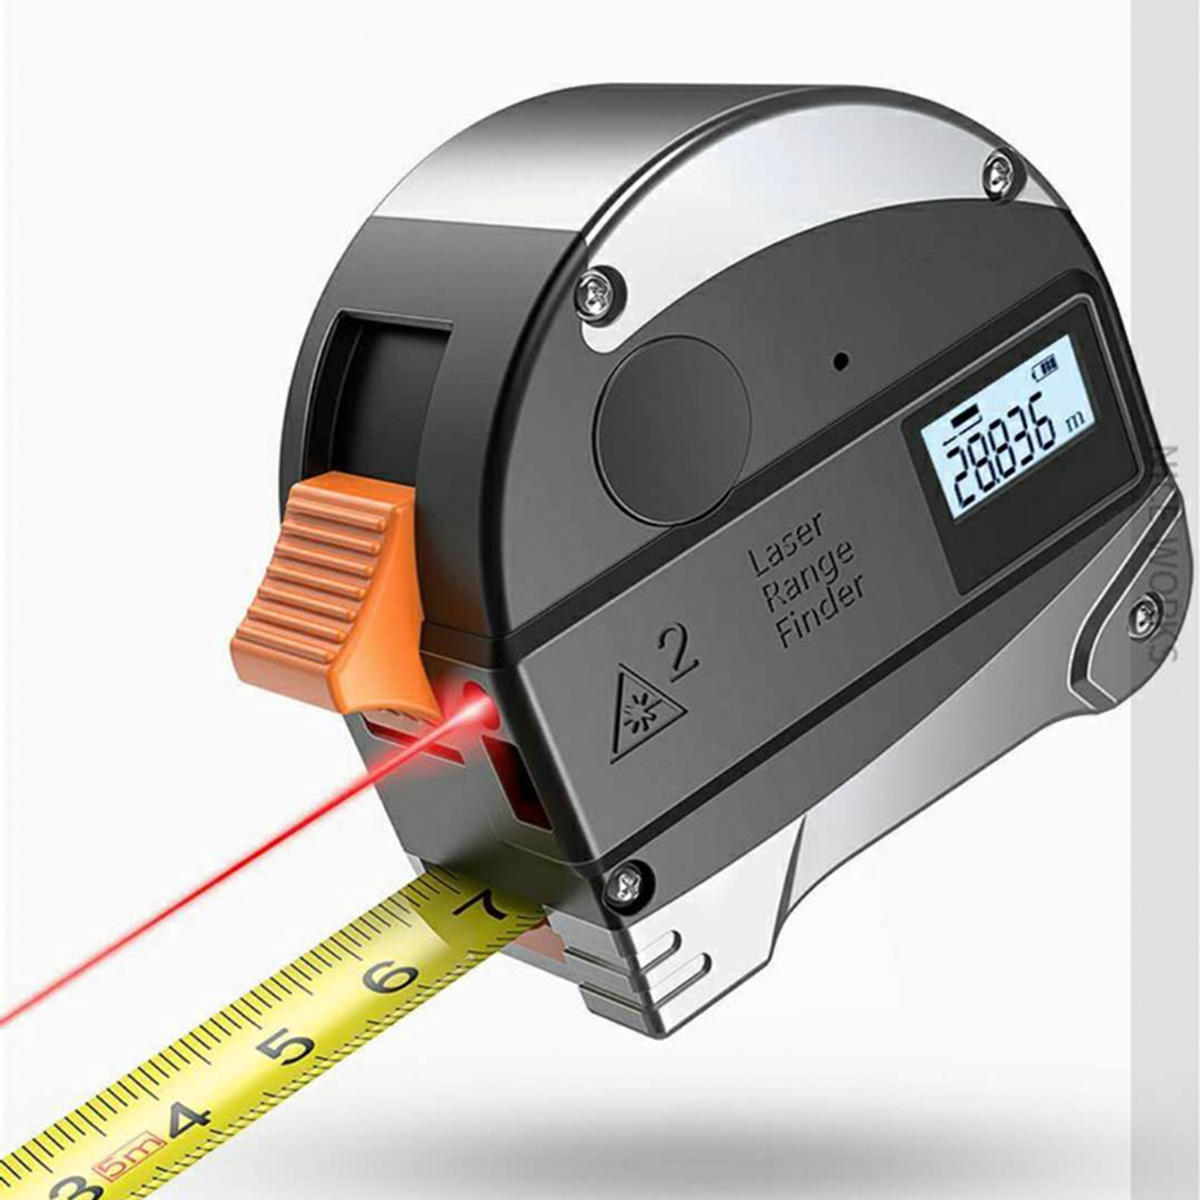 LCD Handheld Digital Laser Point Distance Meter Tape Range Finder Measure 40m